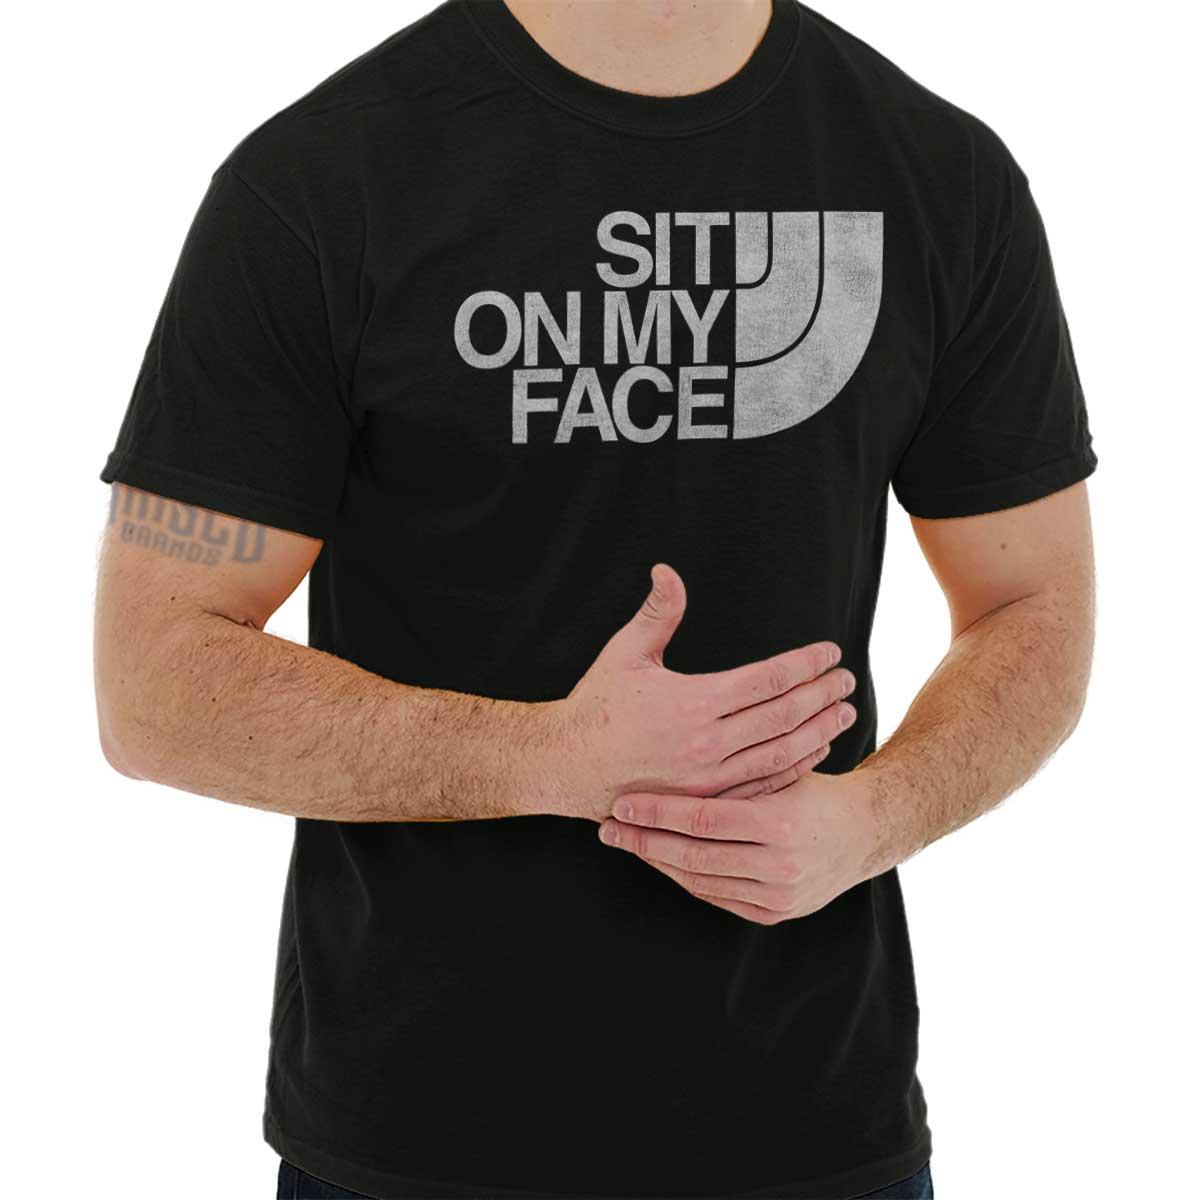 Funny saying x-rated shirt for men choking hazard funny men/'s tee adult humor